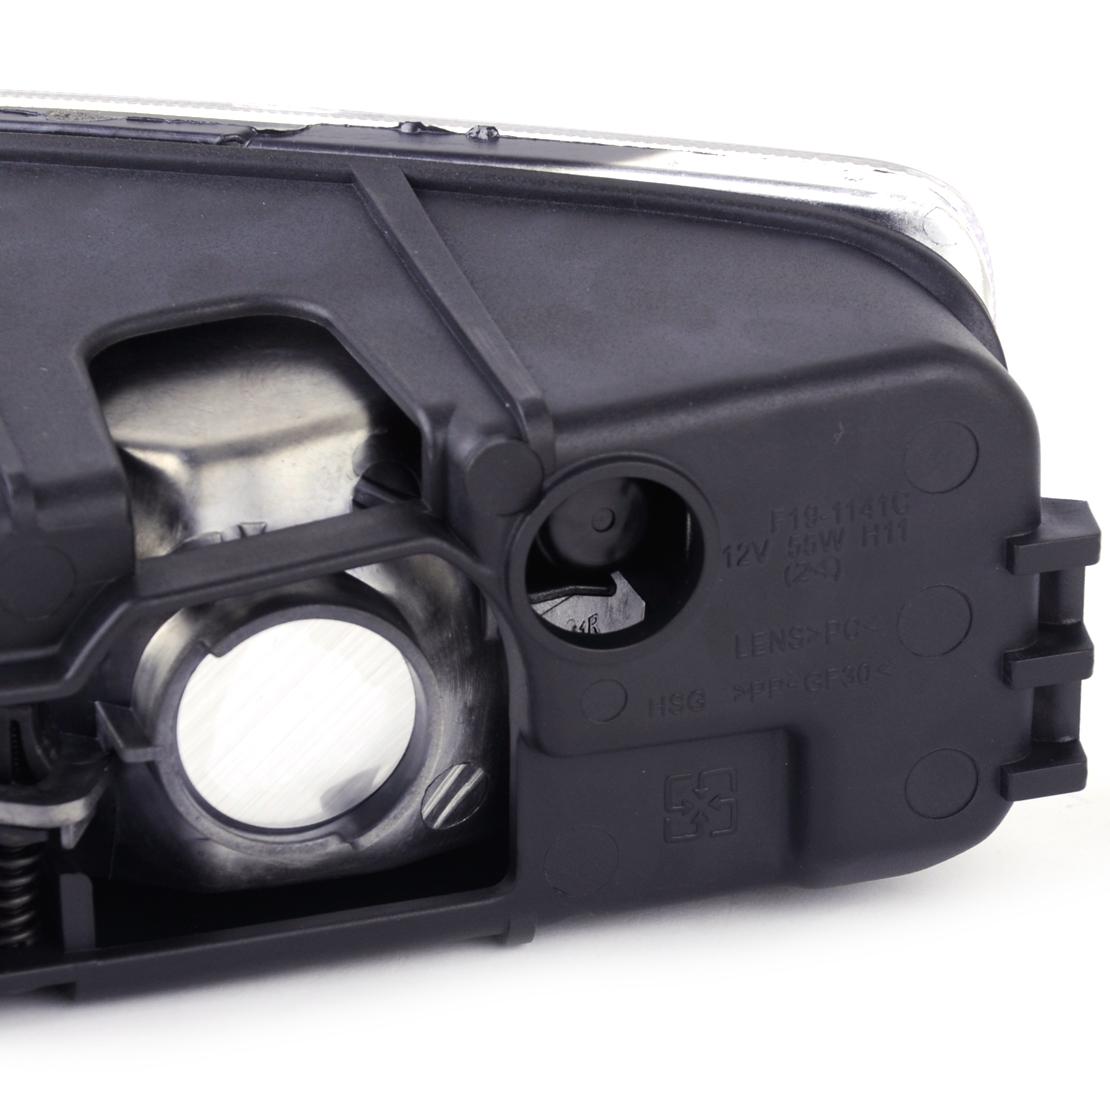 1Pair Front Fog Light Lamp Cover Fits Honda Accord 33951-SDA-H01 33901-SDA-H01